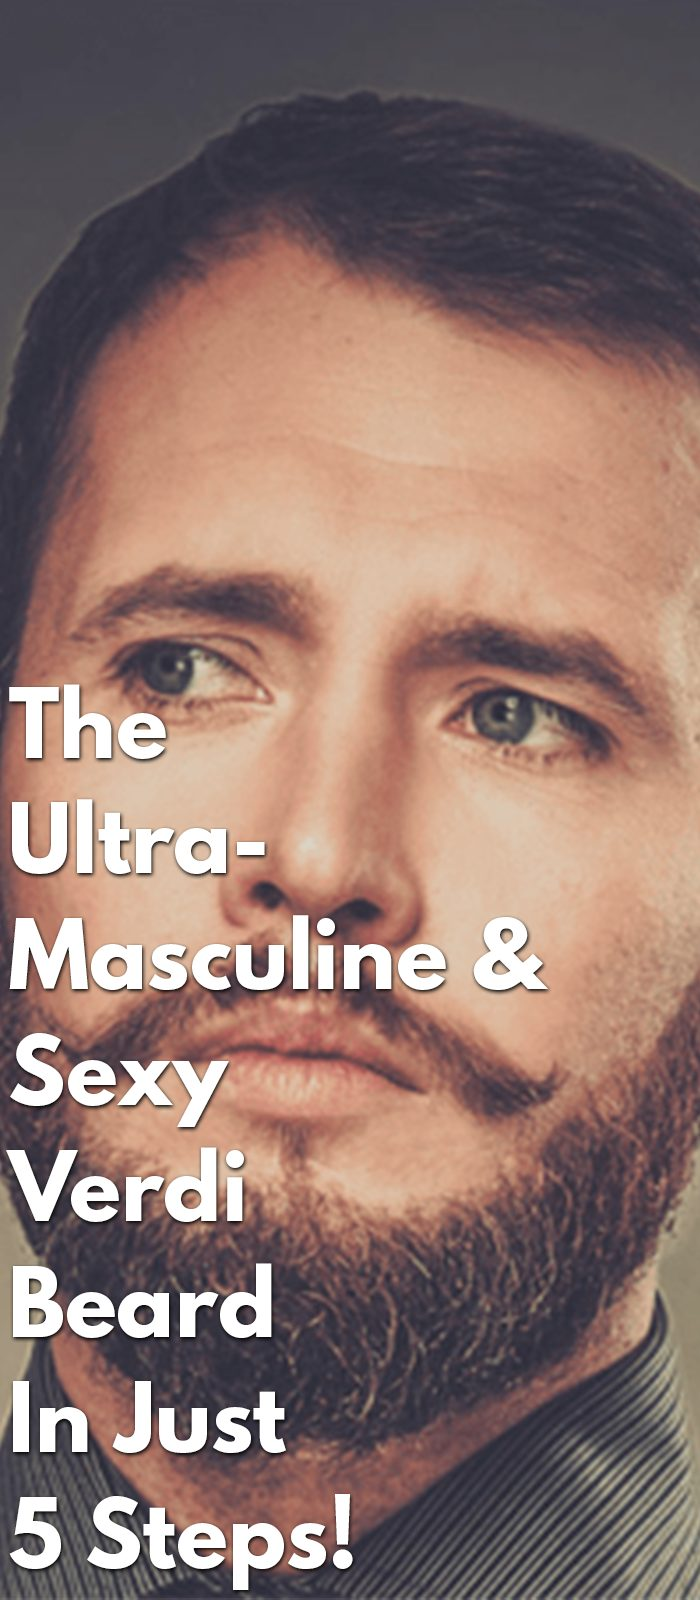 The-Ultra-Masculine-&-Sexy-Verdi-Beard-In-Just-5-Steps!